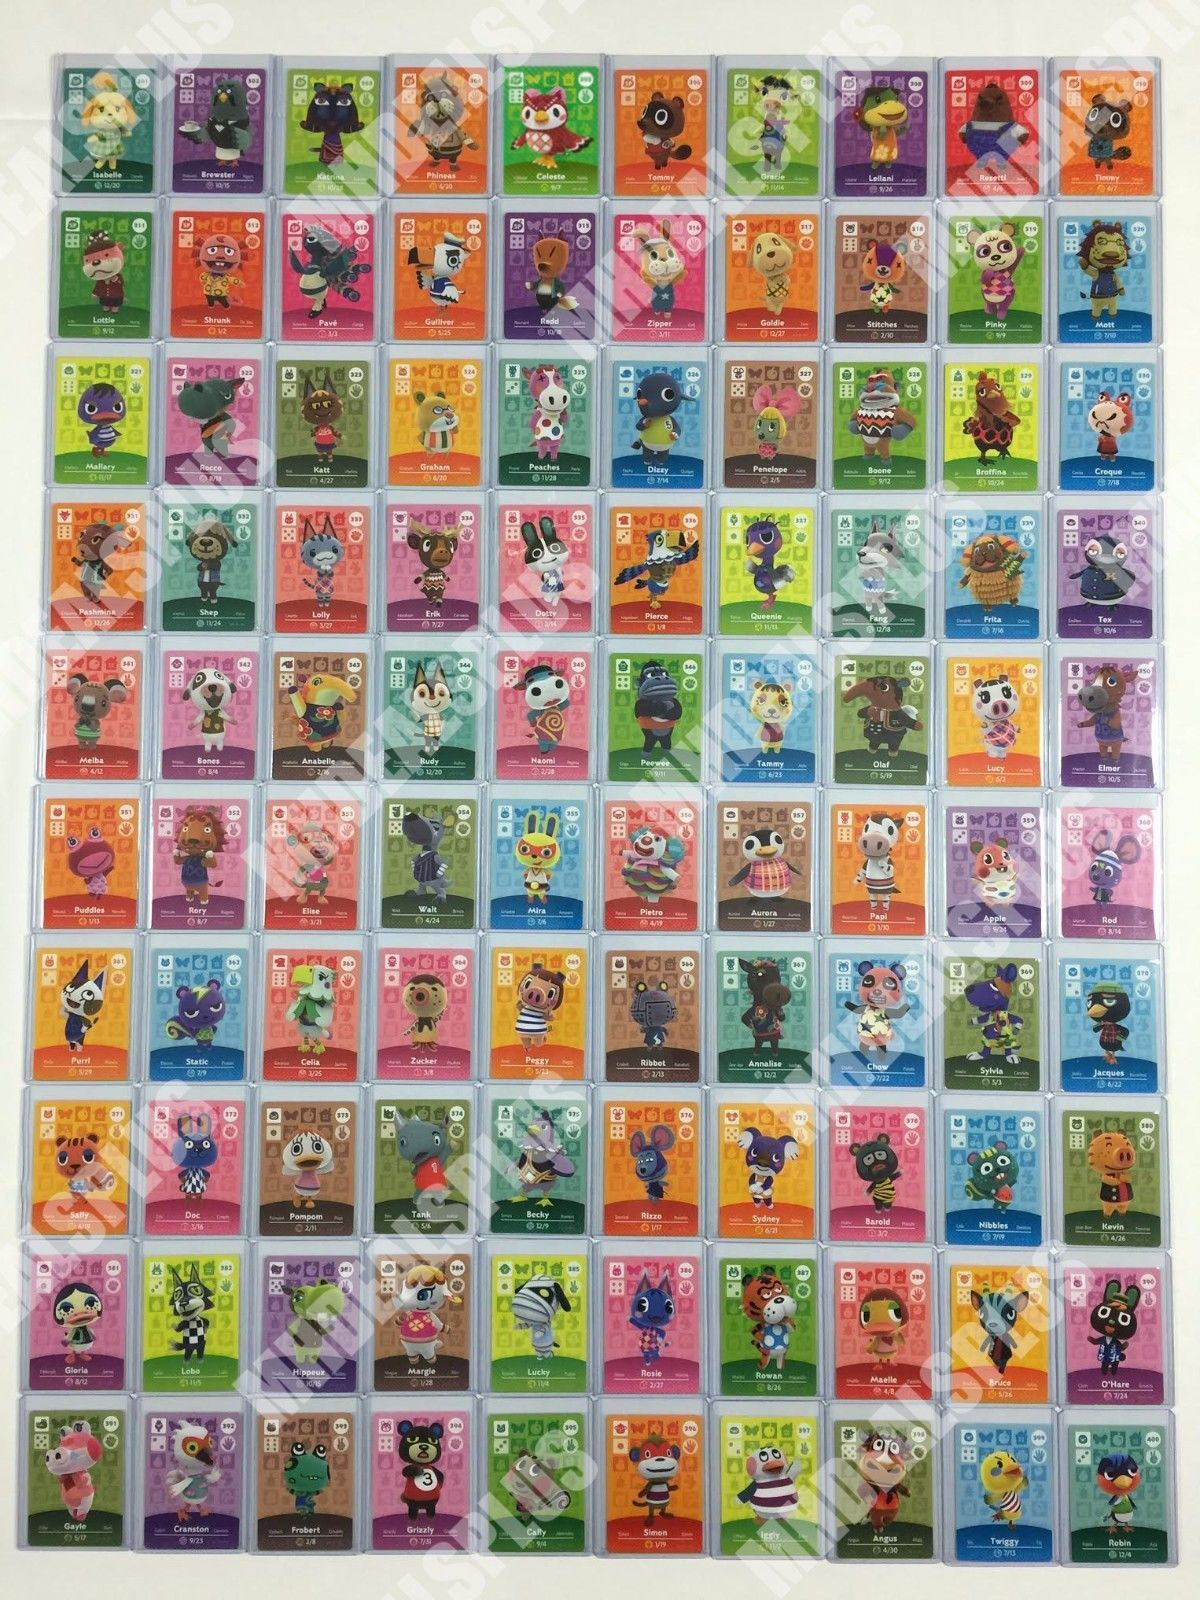 10+ Animal crossing amiibo cards full set images